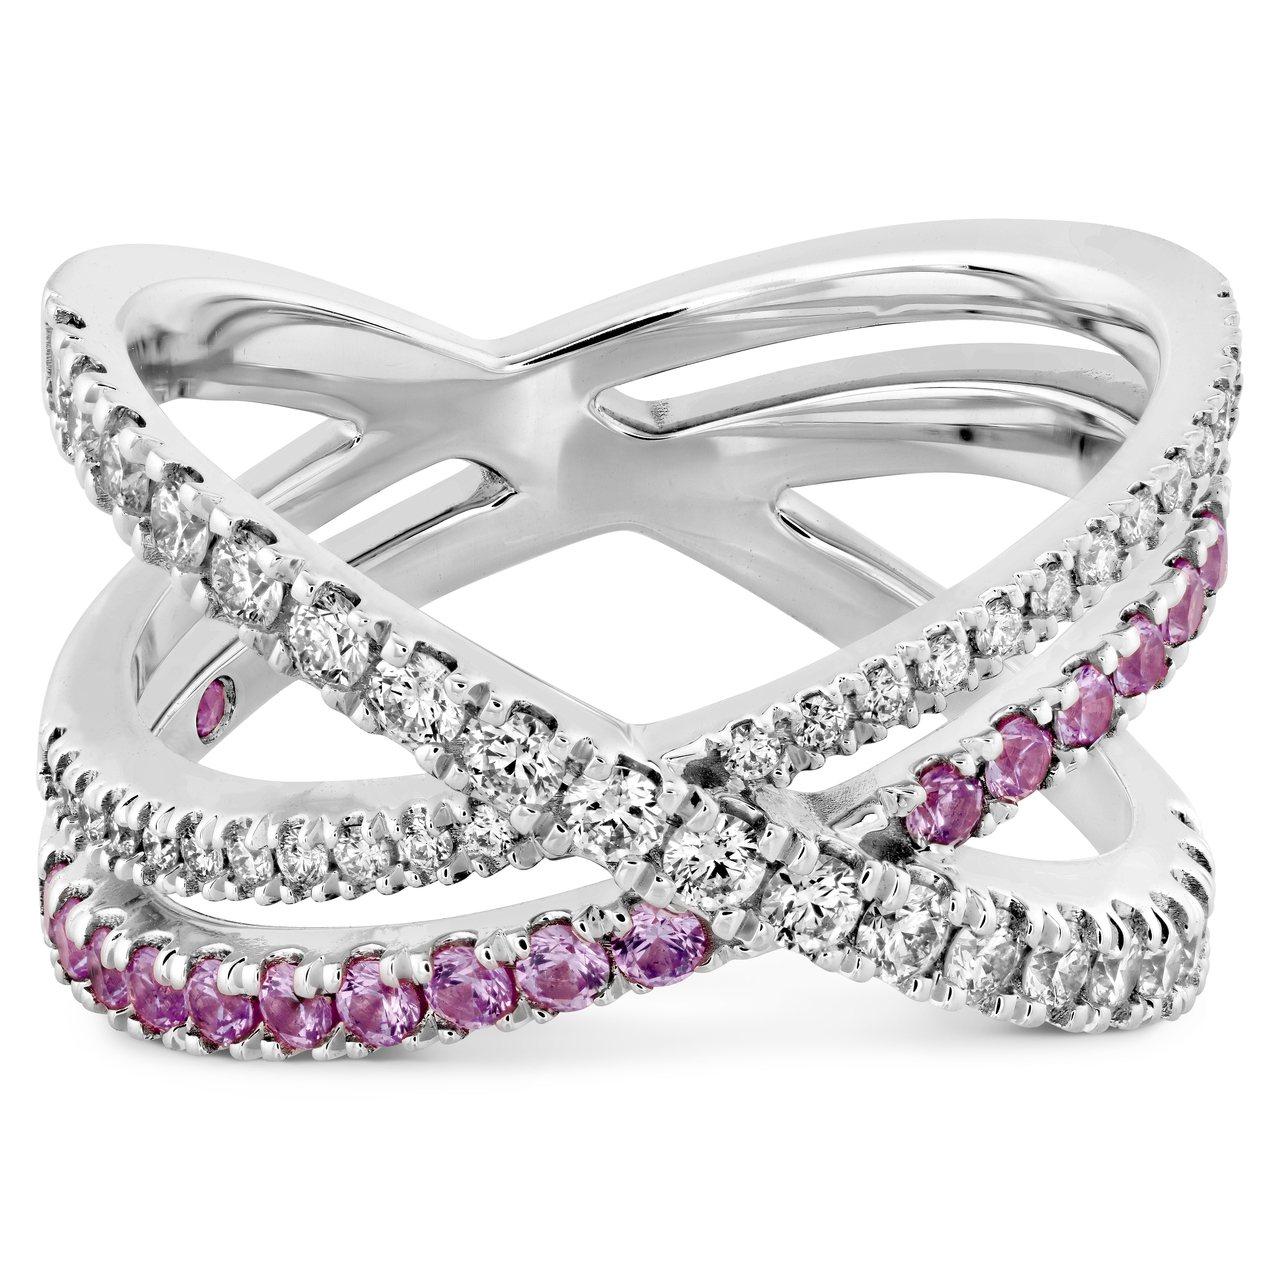 HARLEY WRAP戒指,白K金、鑽石、粉紅剛玉 ,售價12萬元。圖/HEAR...